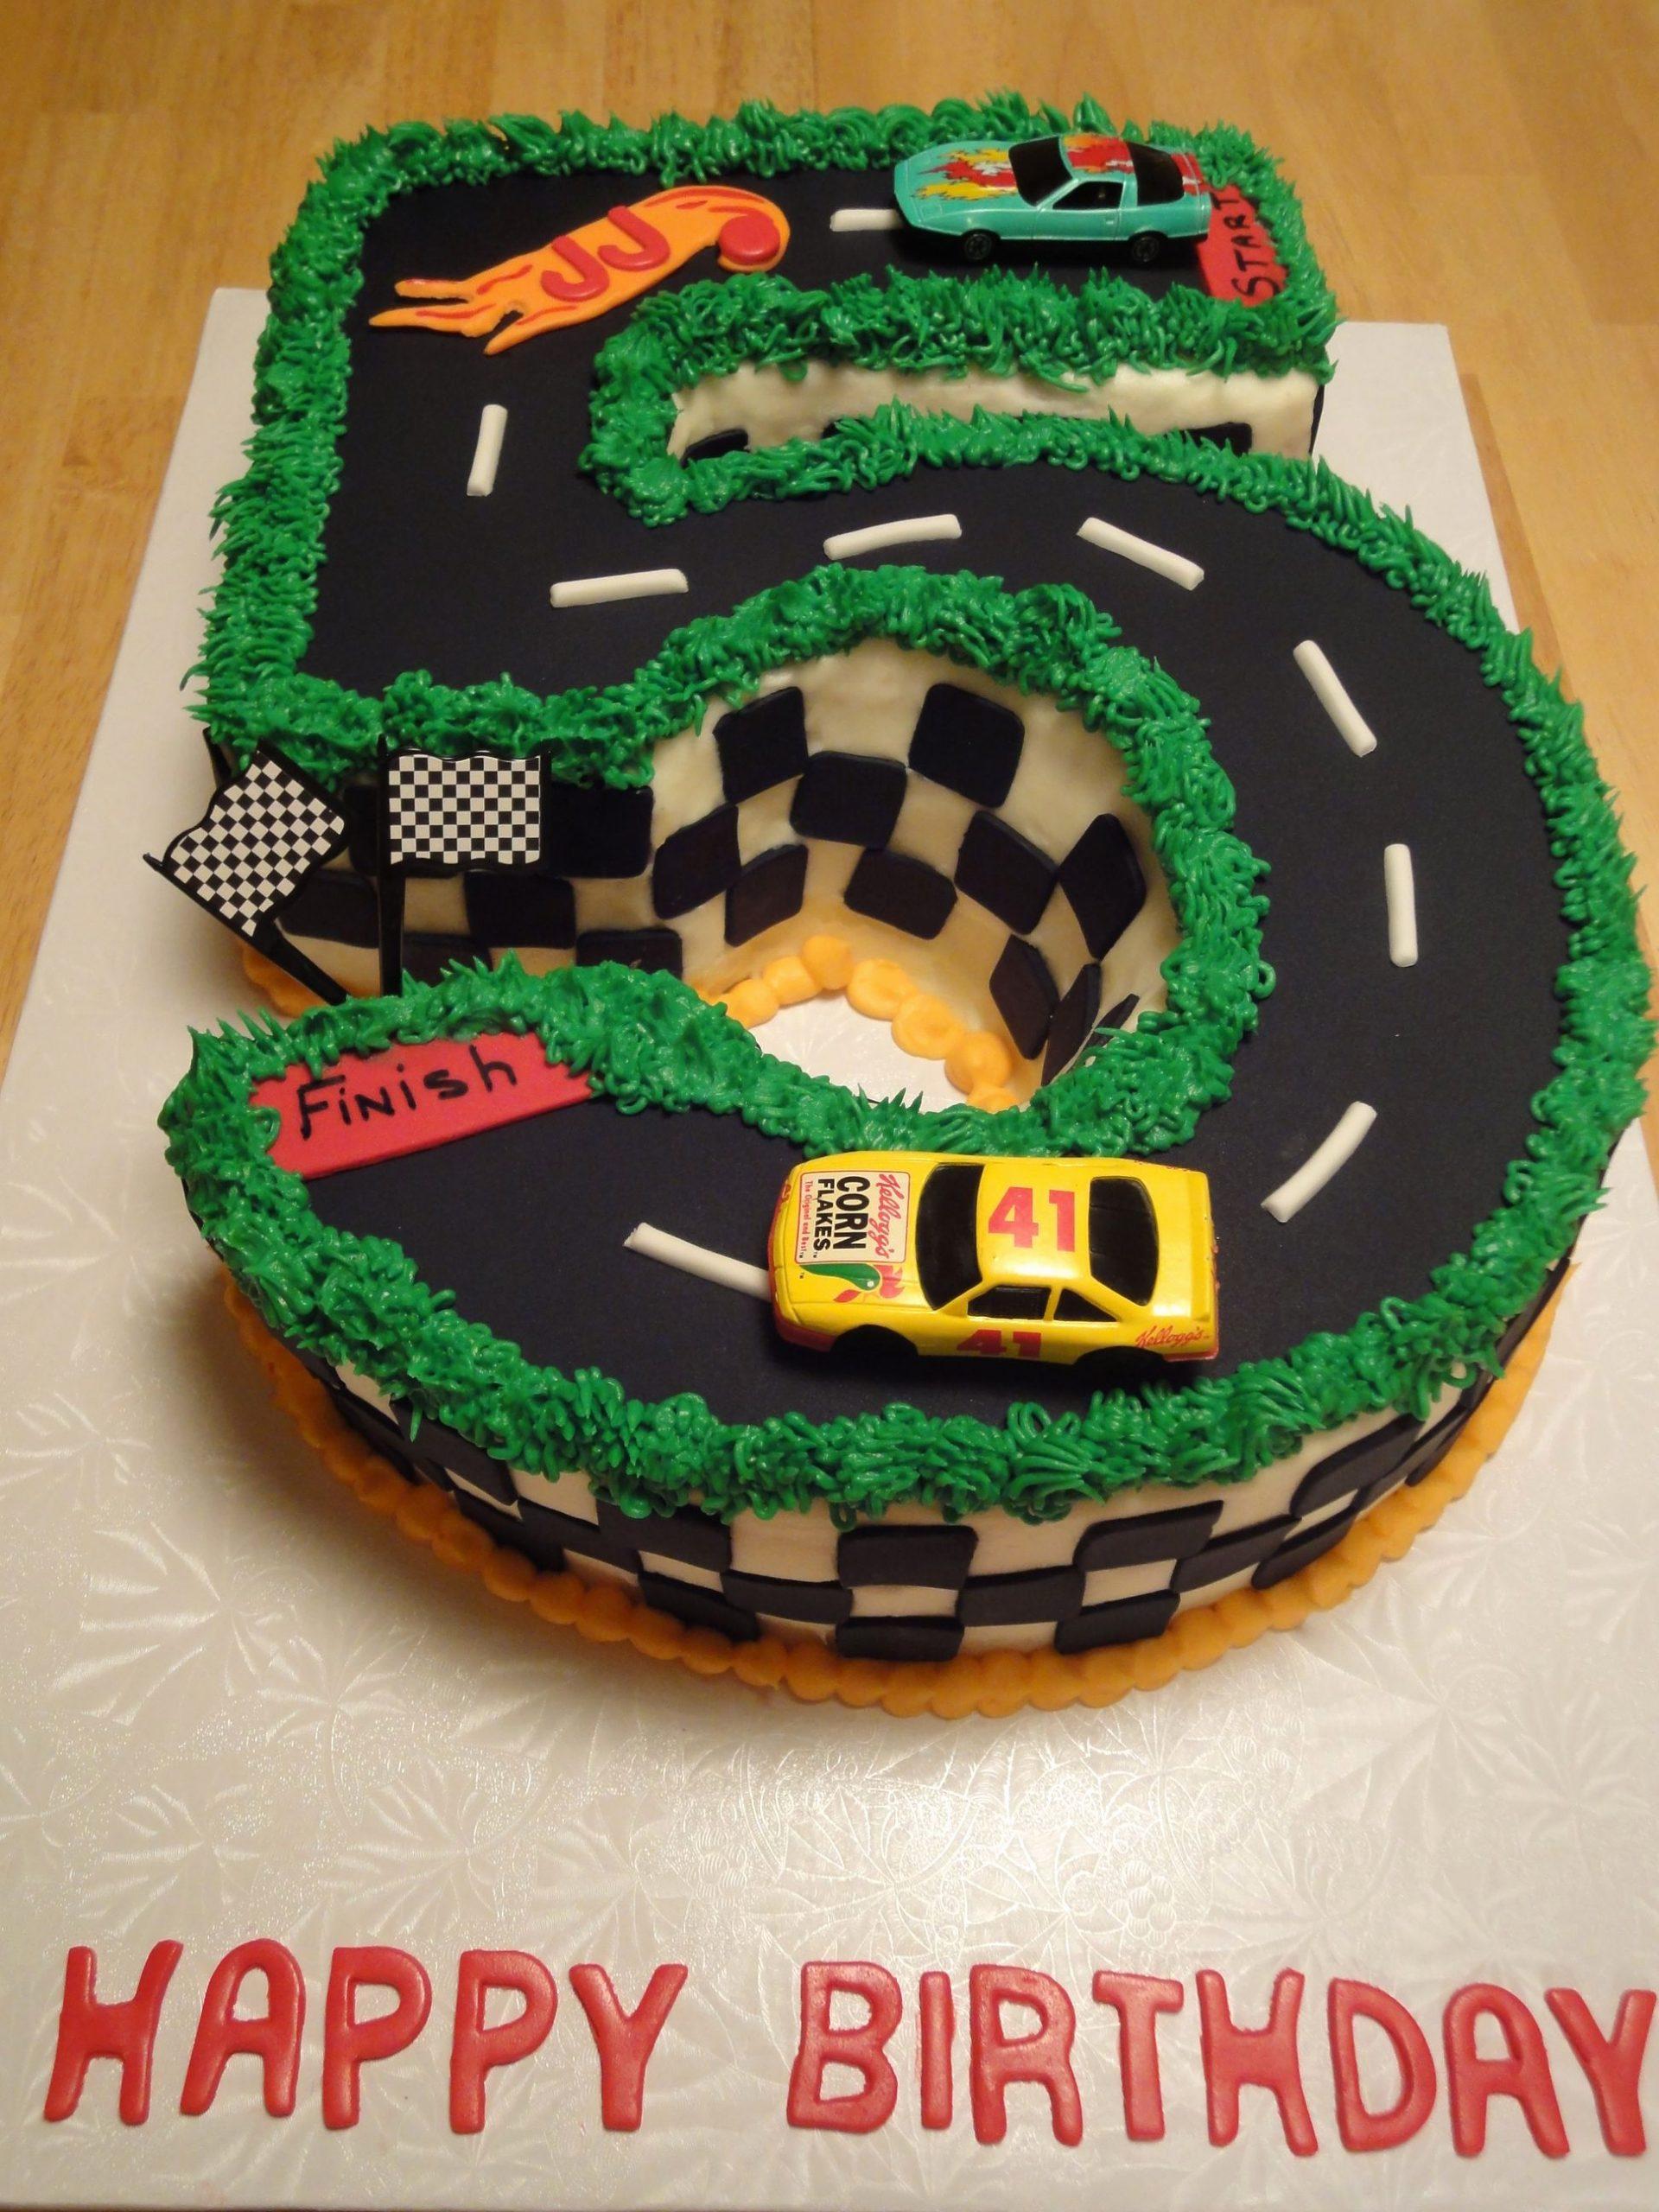 Birthday Decoration Ideas for 5 Year Old Boy Inspirational Happy Birthday to A 5 Year Old Boy Hot Wheels Cake